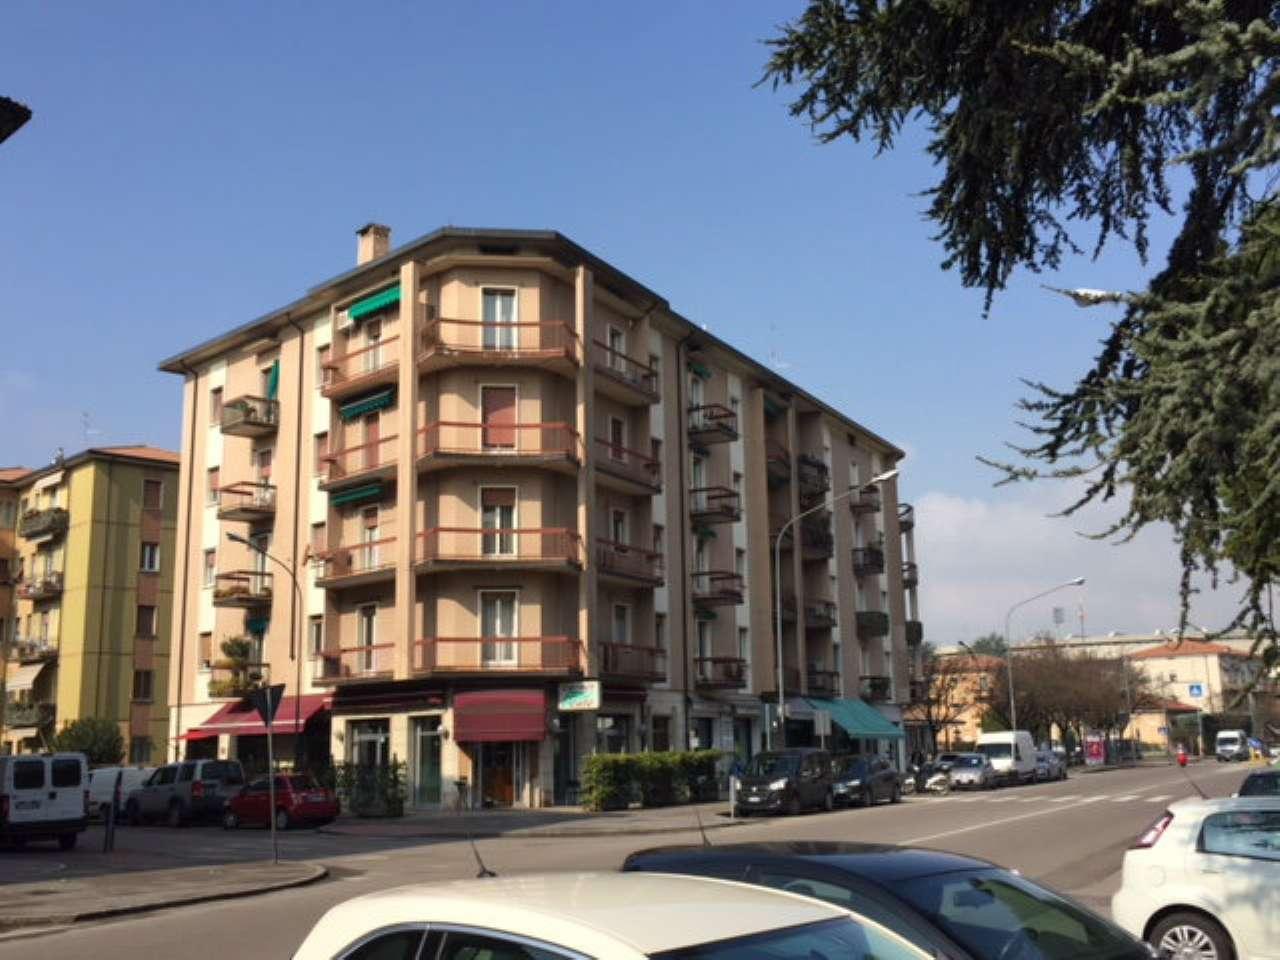 Appartamento, palladio, Stadio, Vendita - Verona